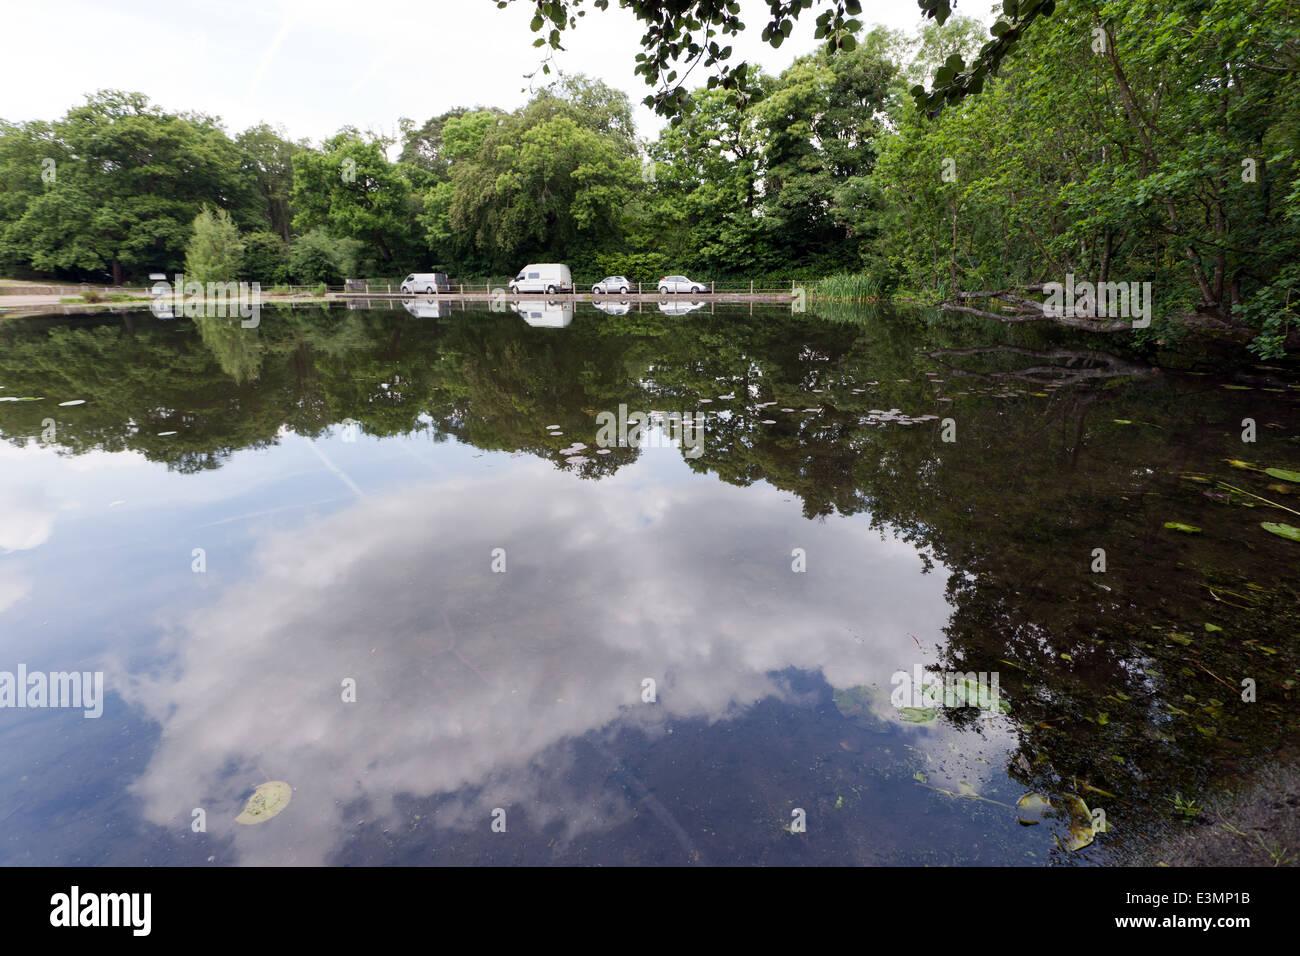 View of fishponds road keston ponds bromley kent stock for Garden pond kent